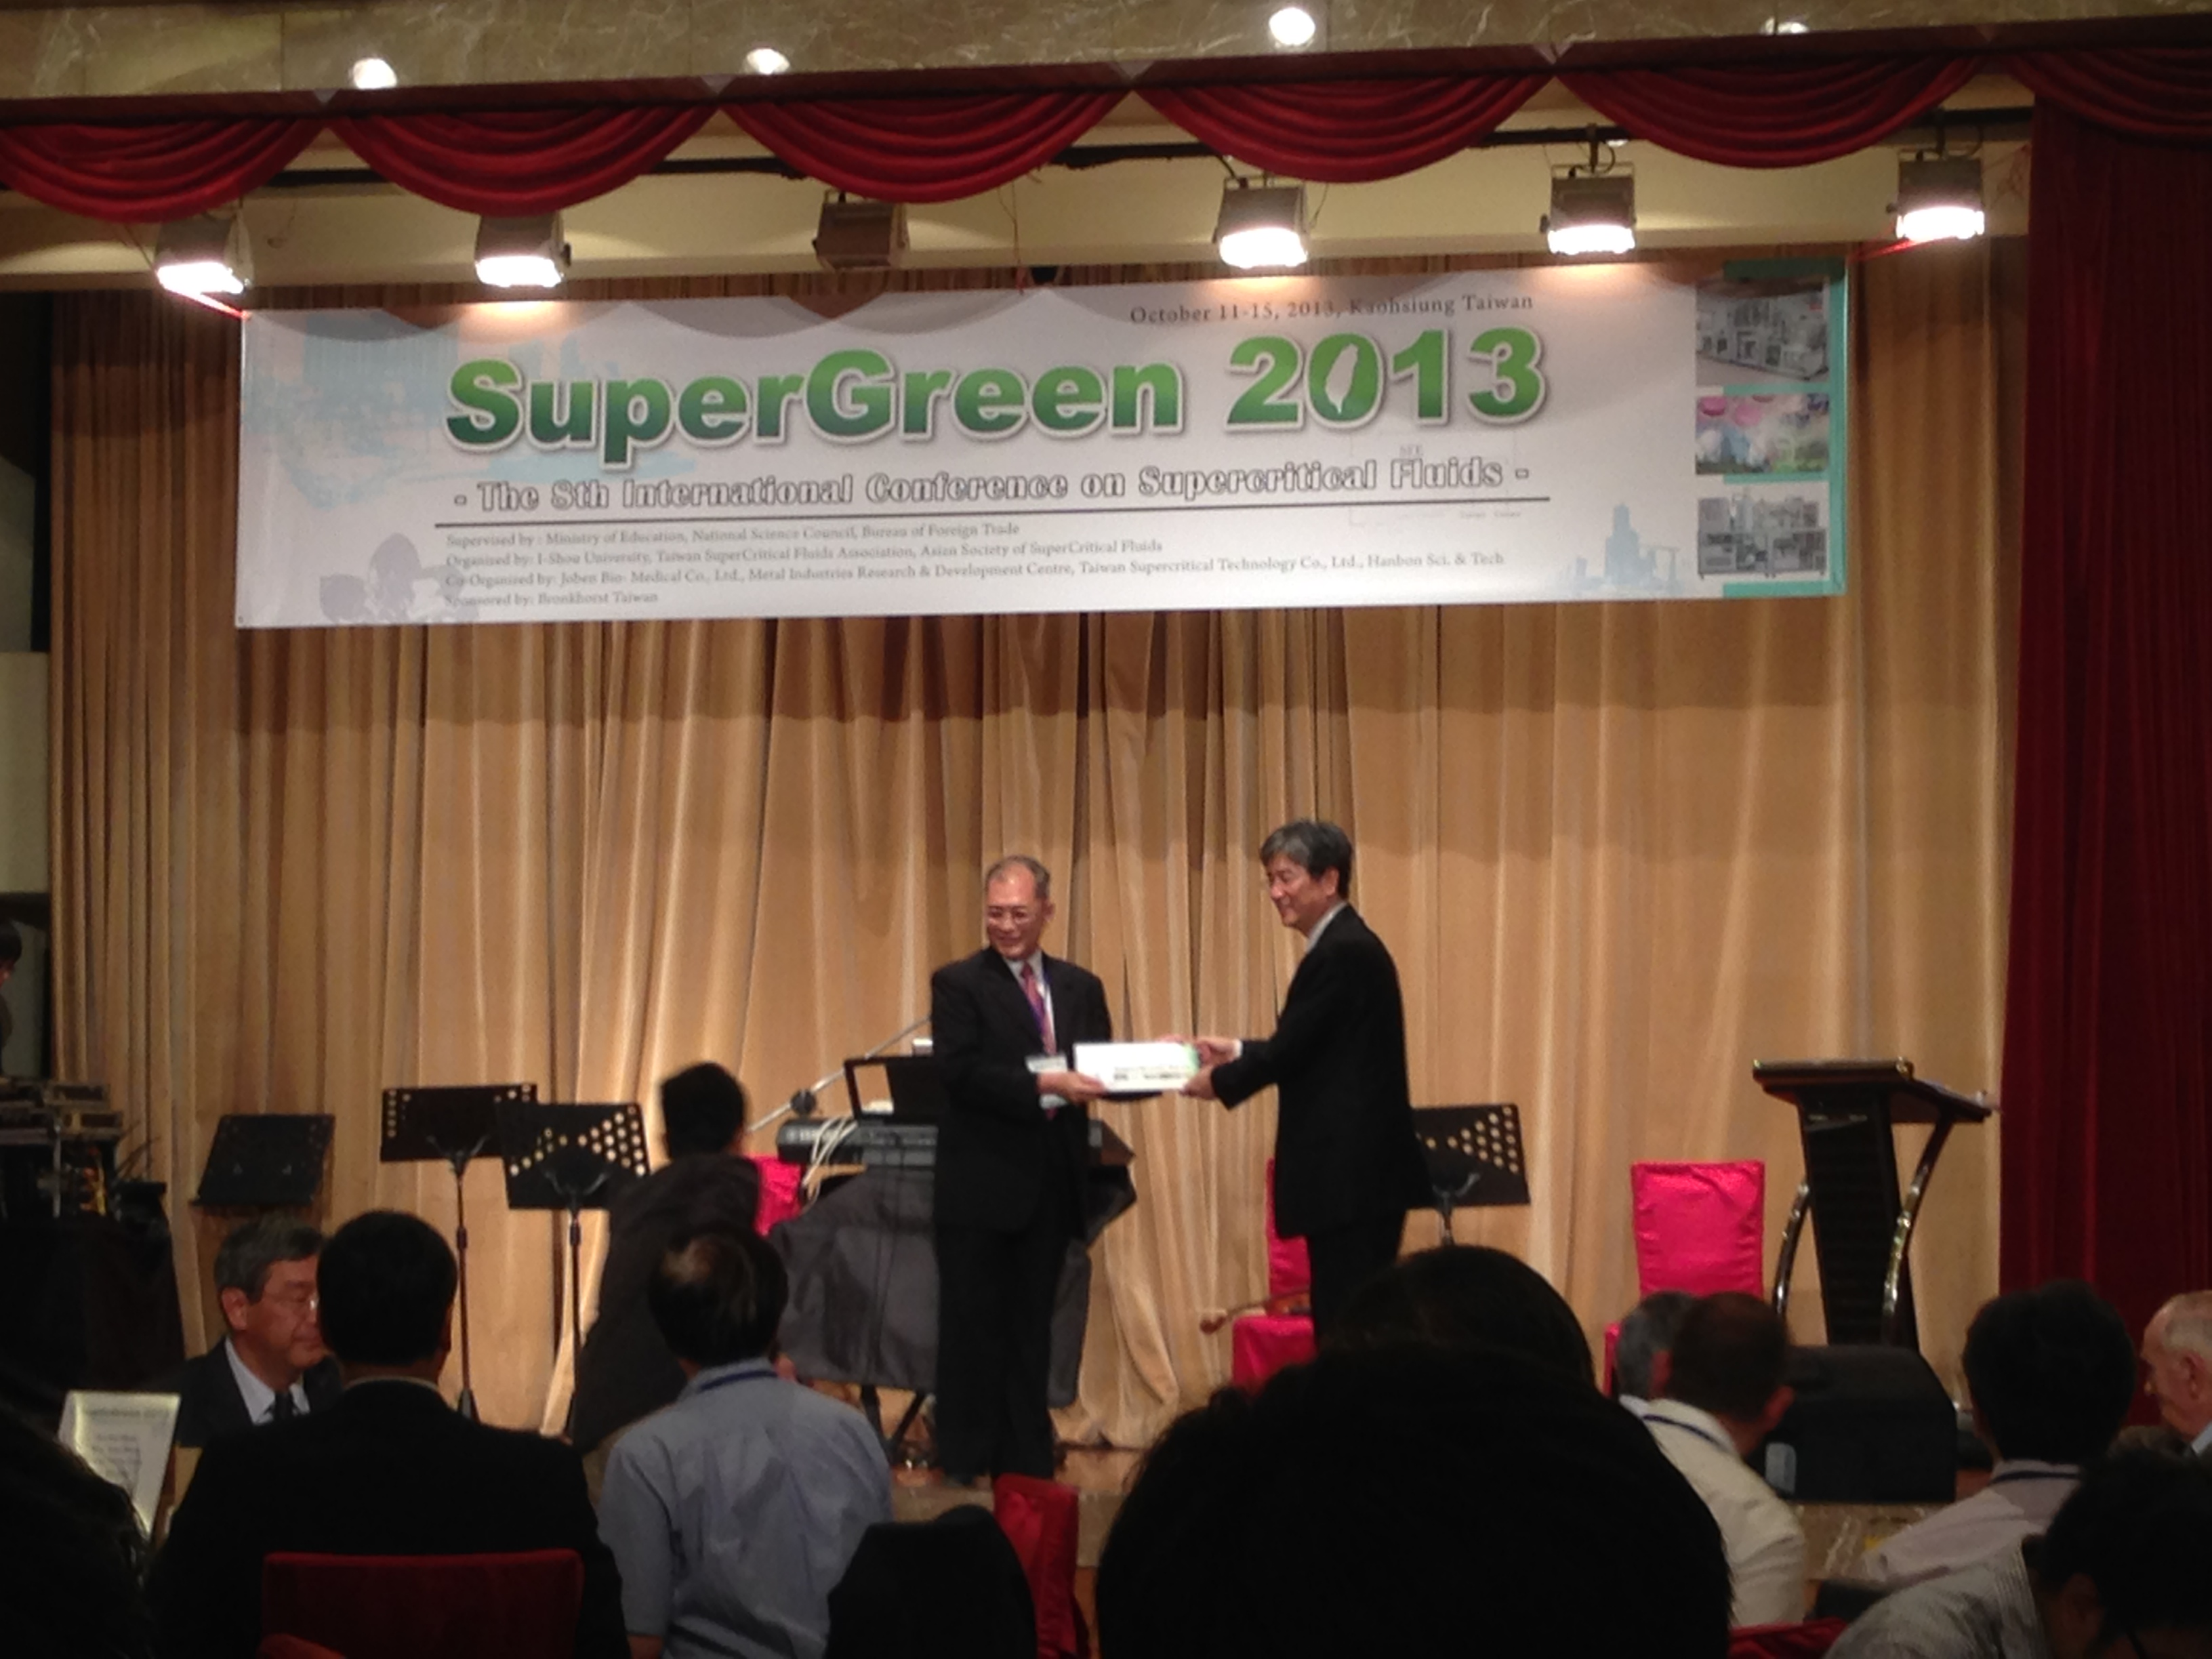 2013 10 12 Supergreen_IMG_2075.JPG